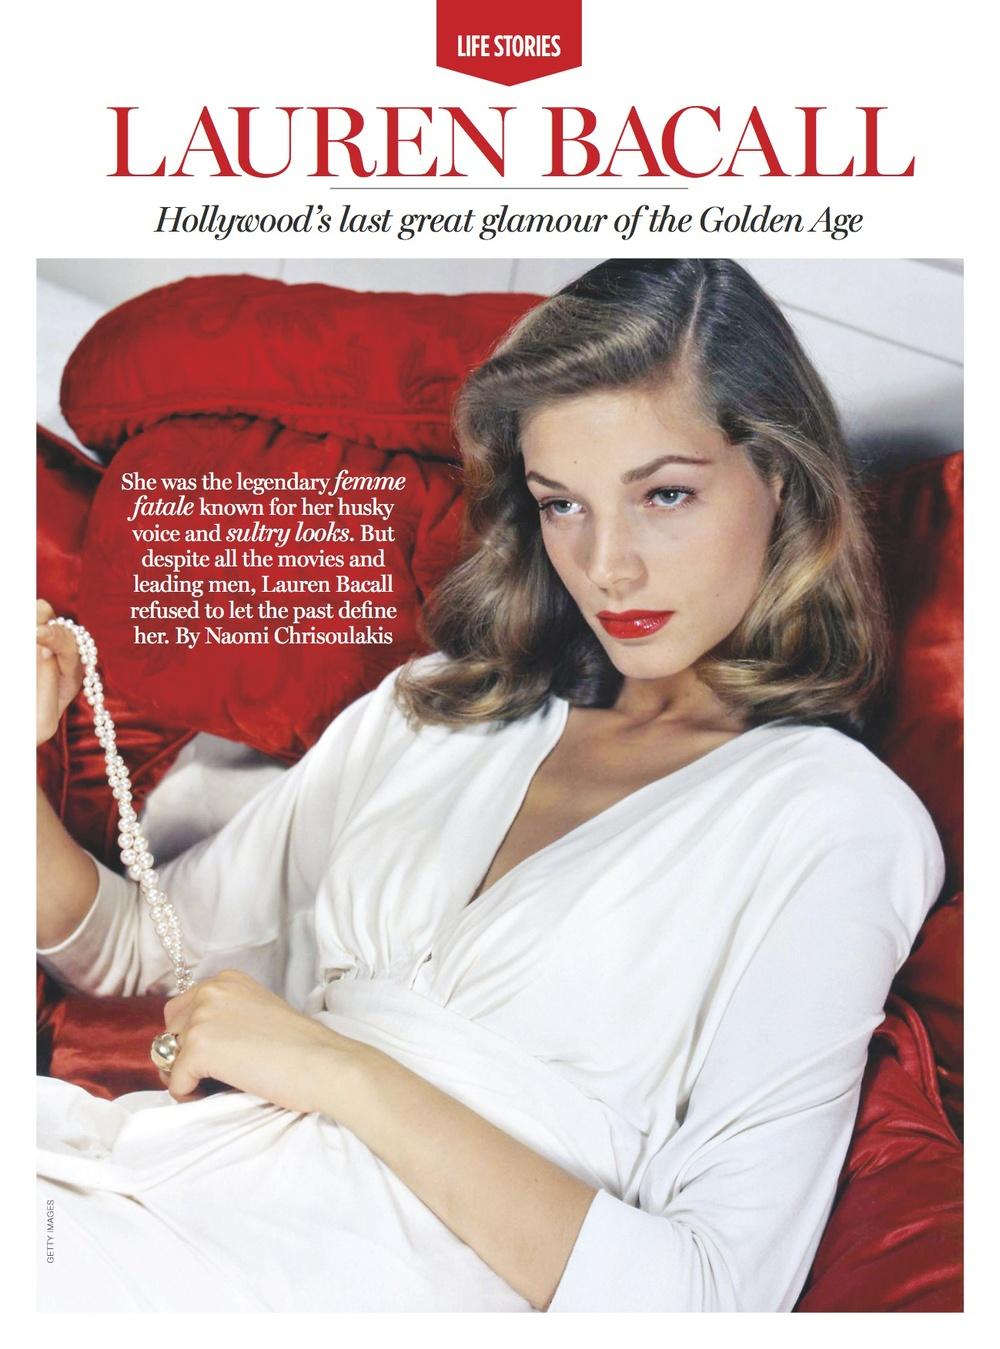 Lauren Bacall Life story